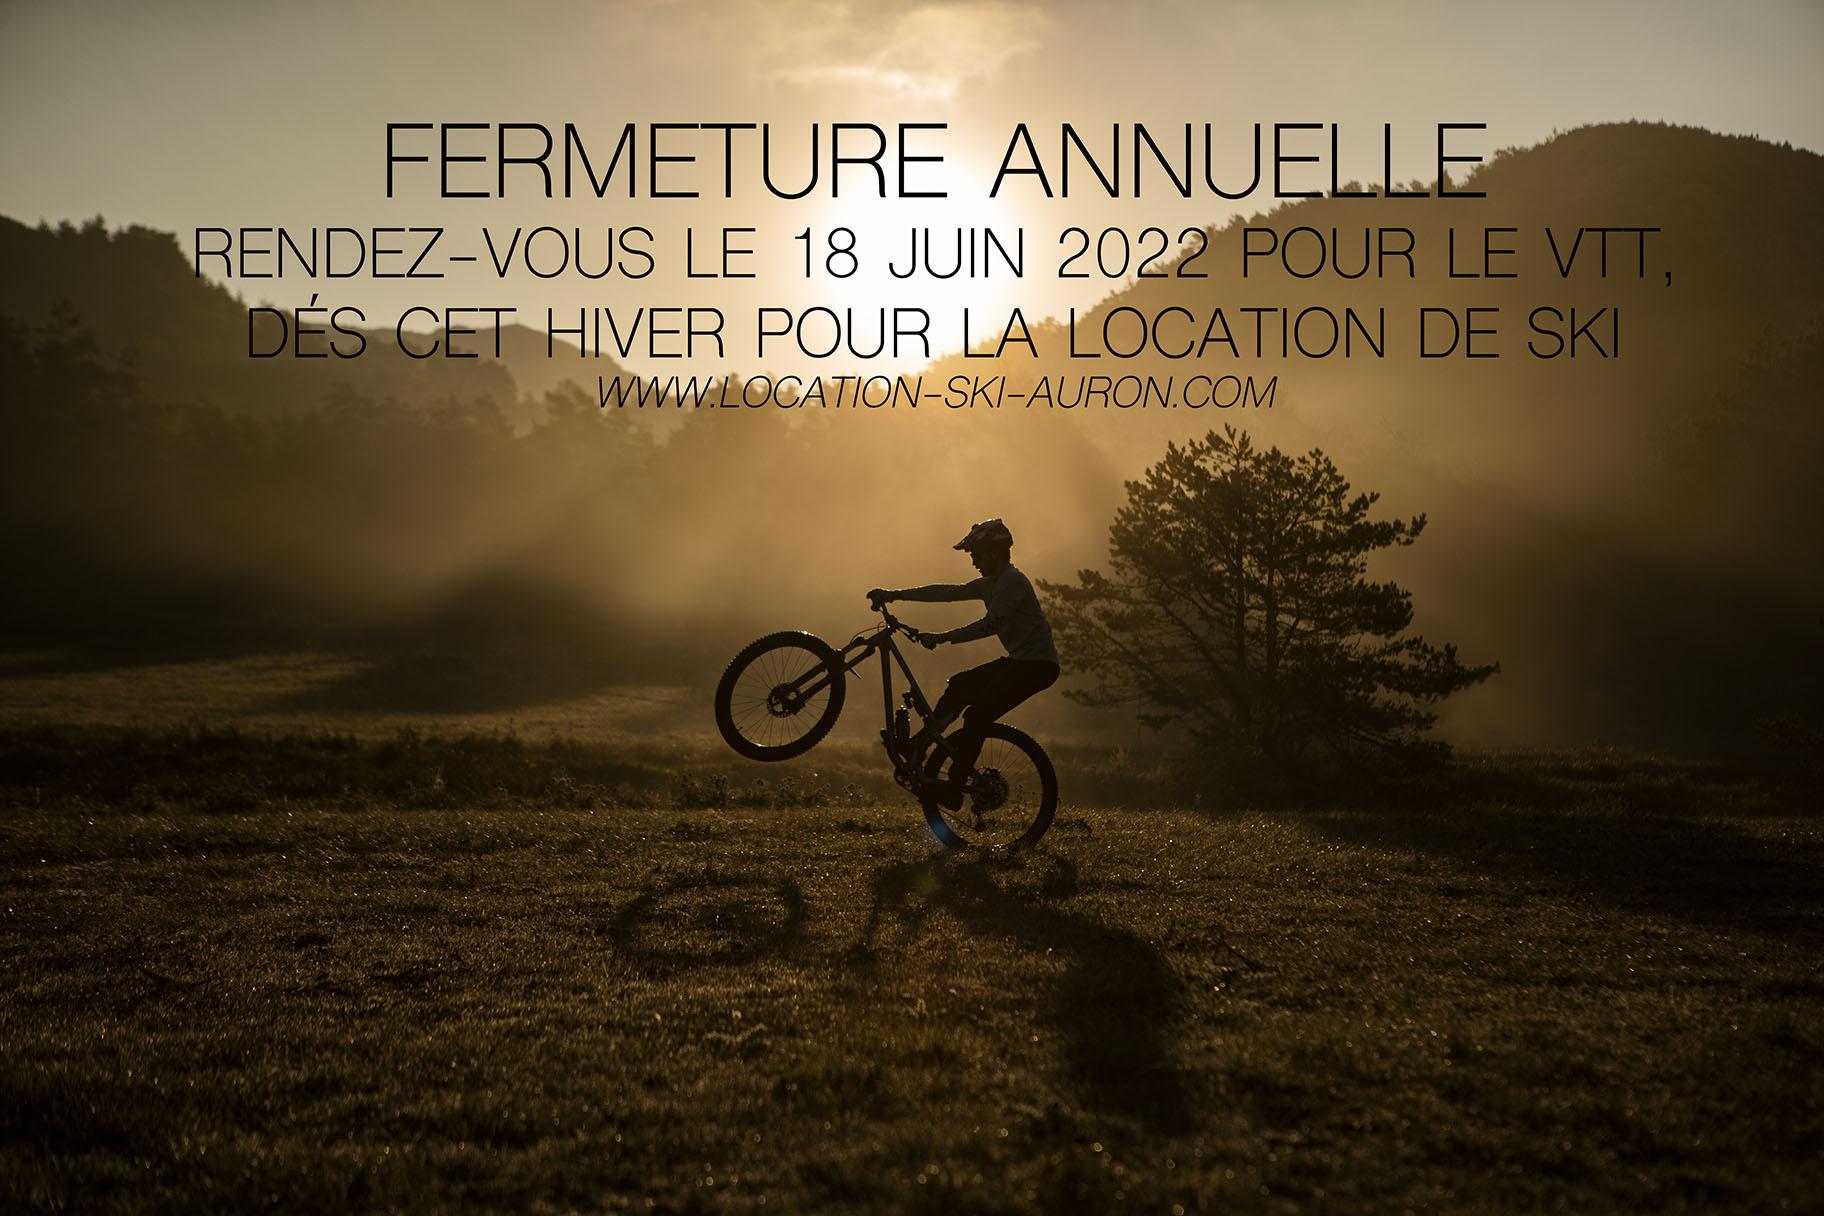 FERMETURE ANNUELLE